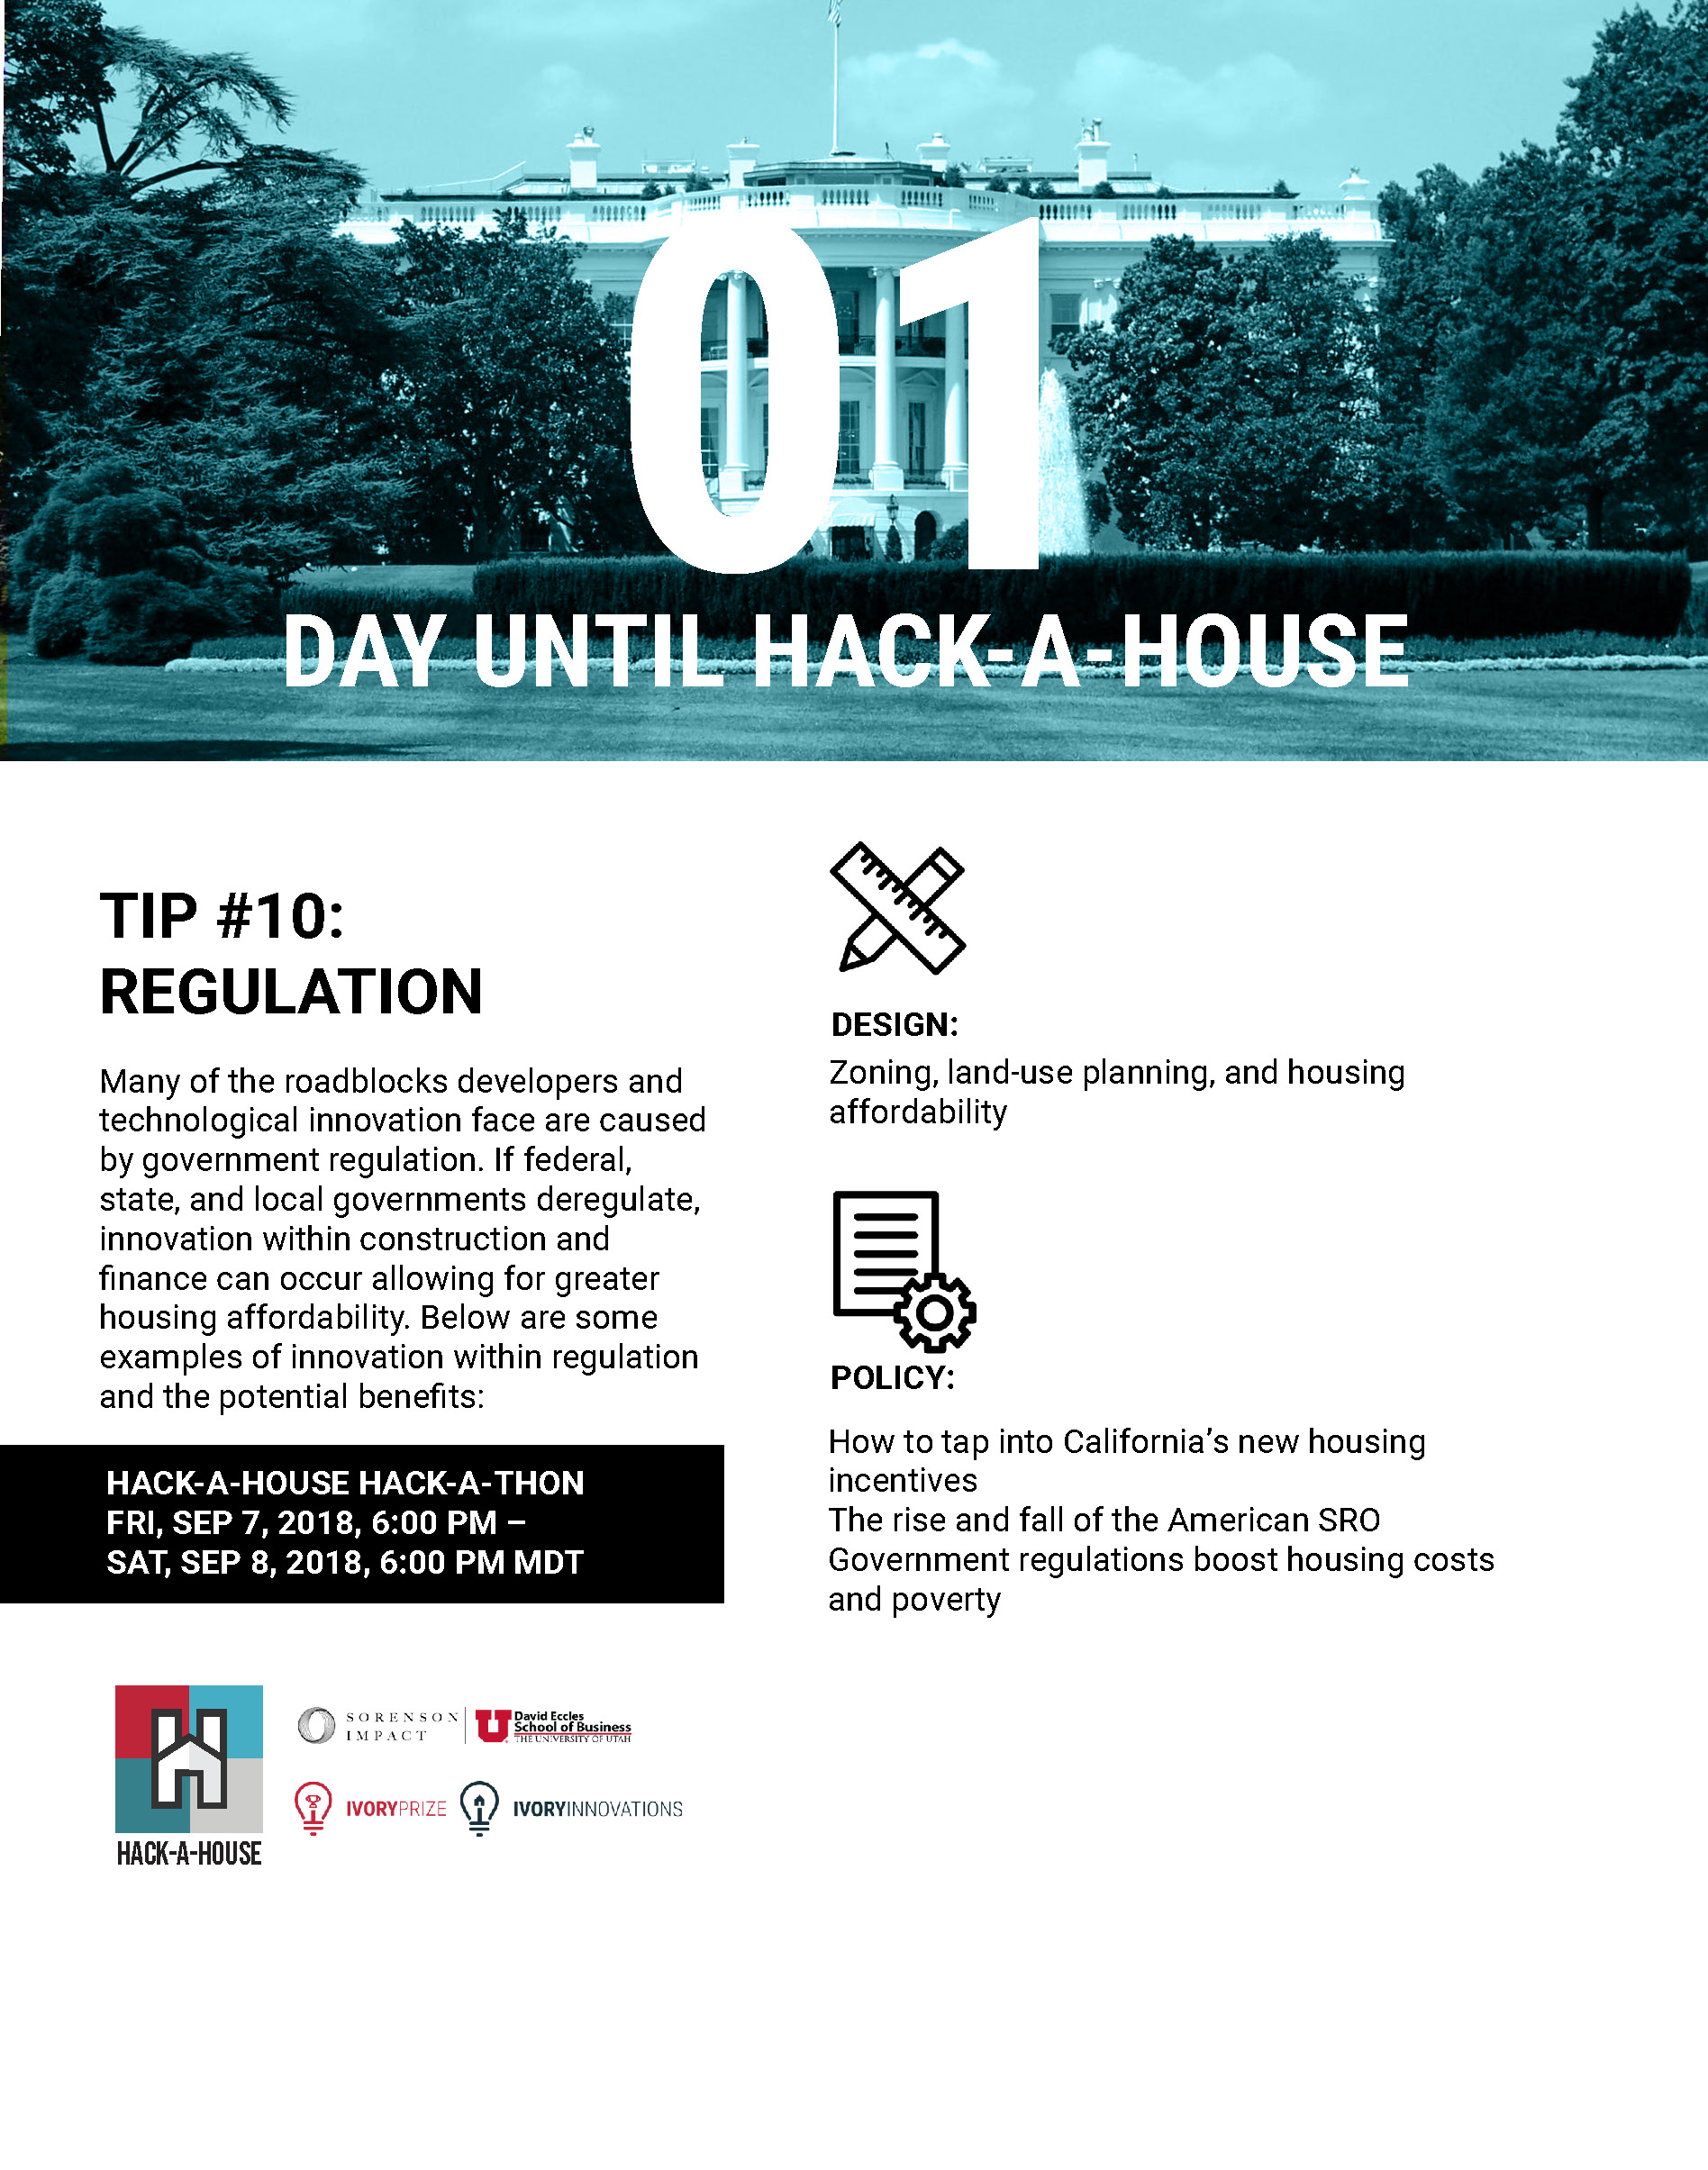 hack-a-house countdown_10.jpg